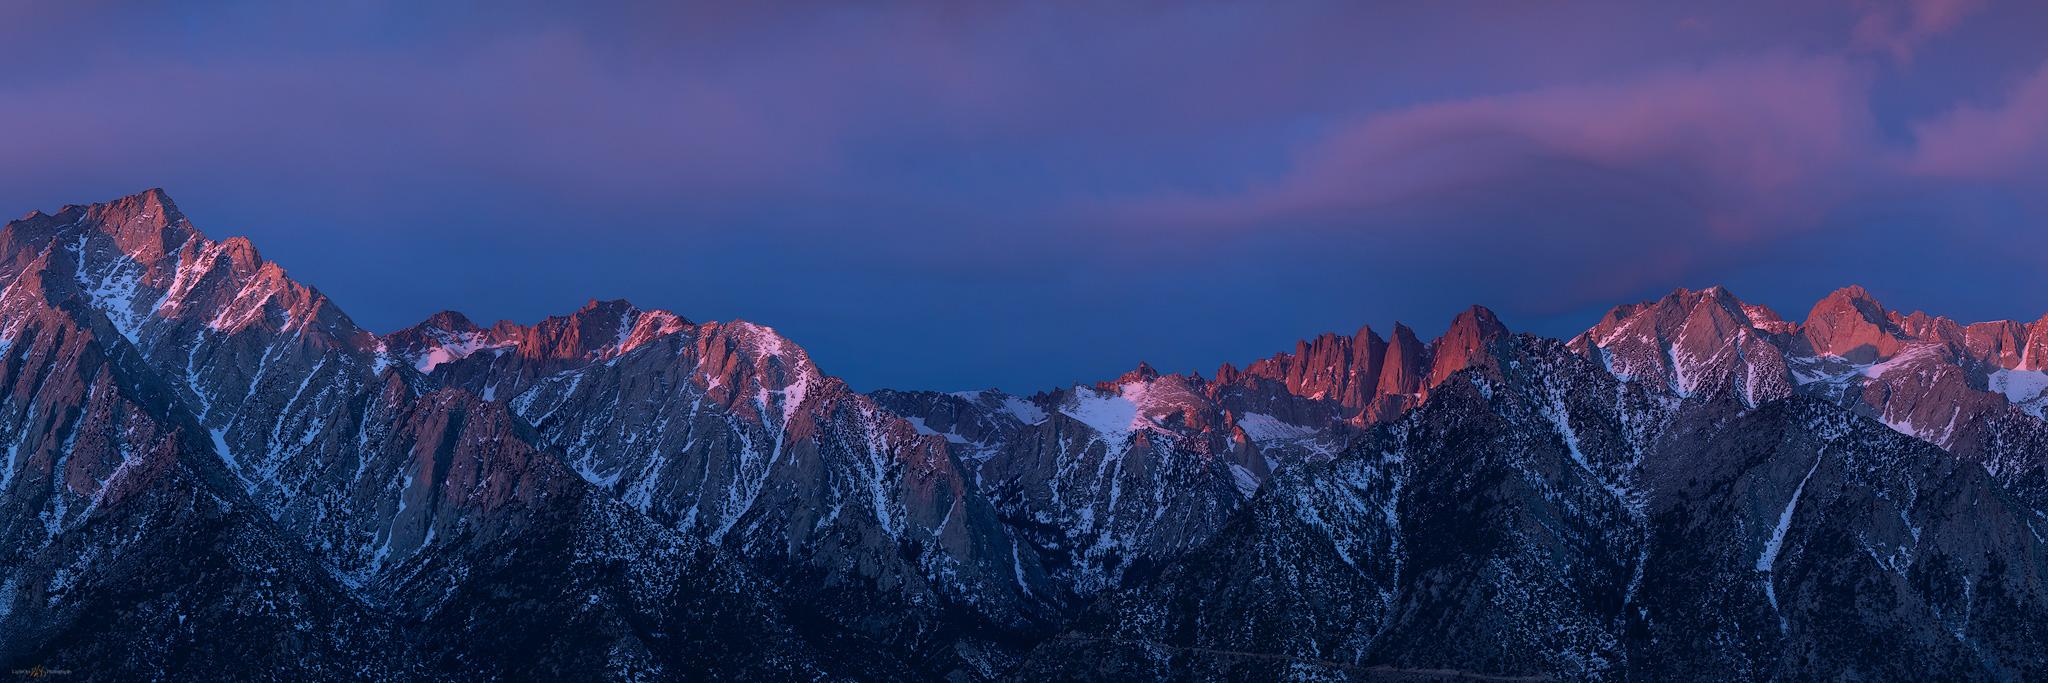 Panorama of the Sierra Nevada at Mount Whitney, Alabama Hills, California